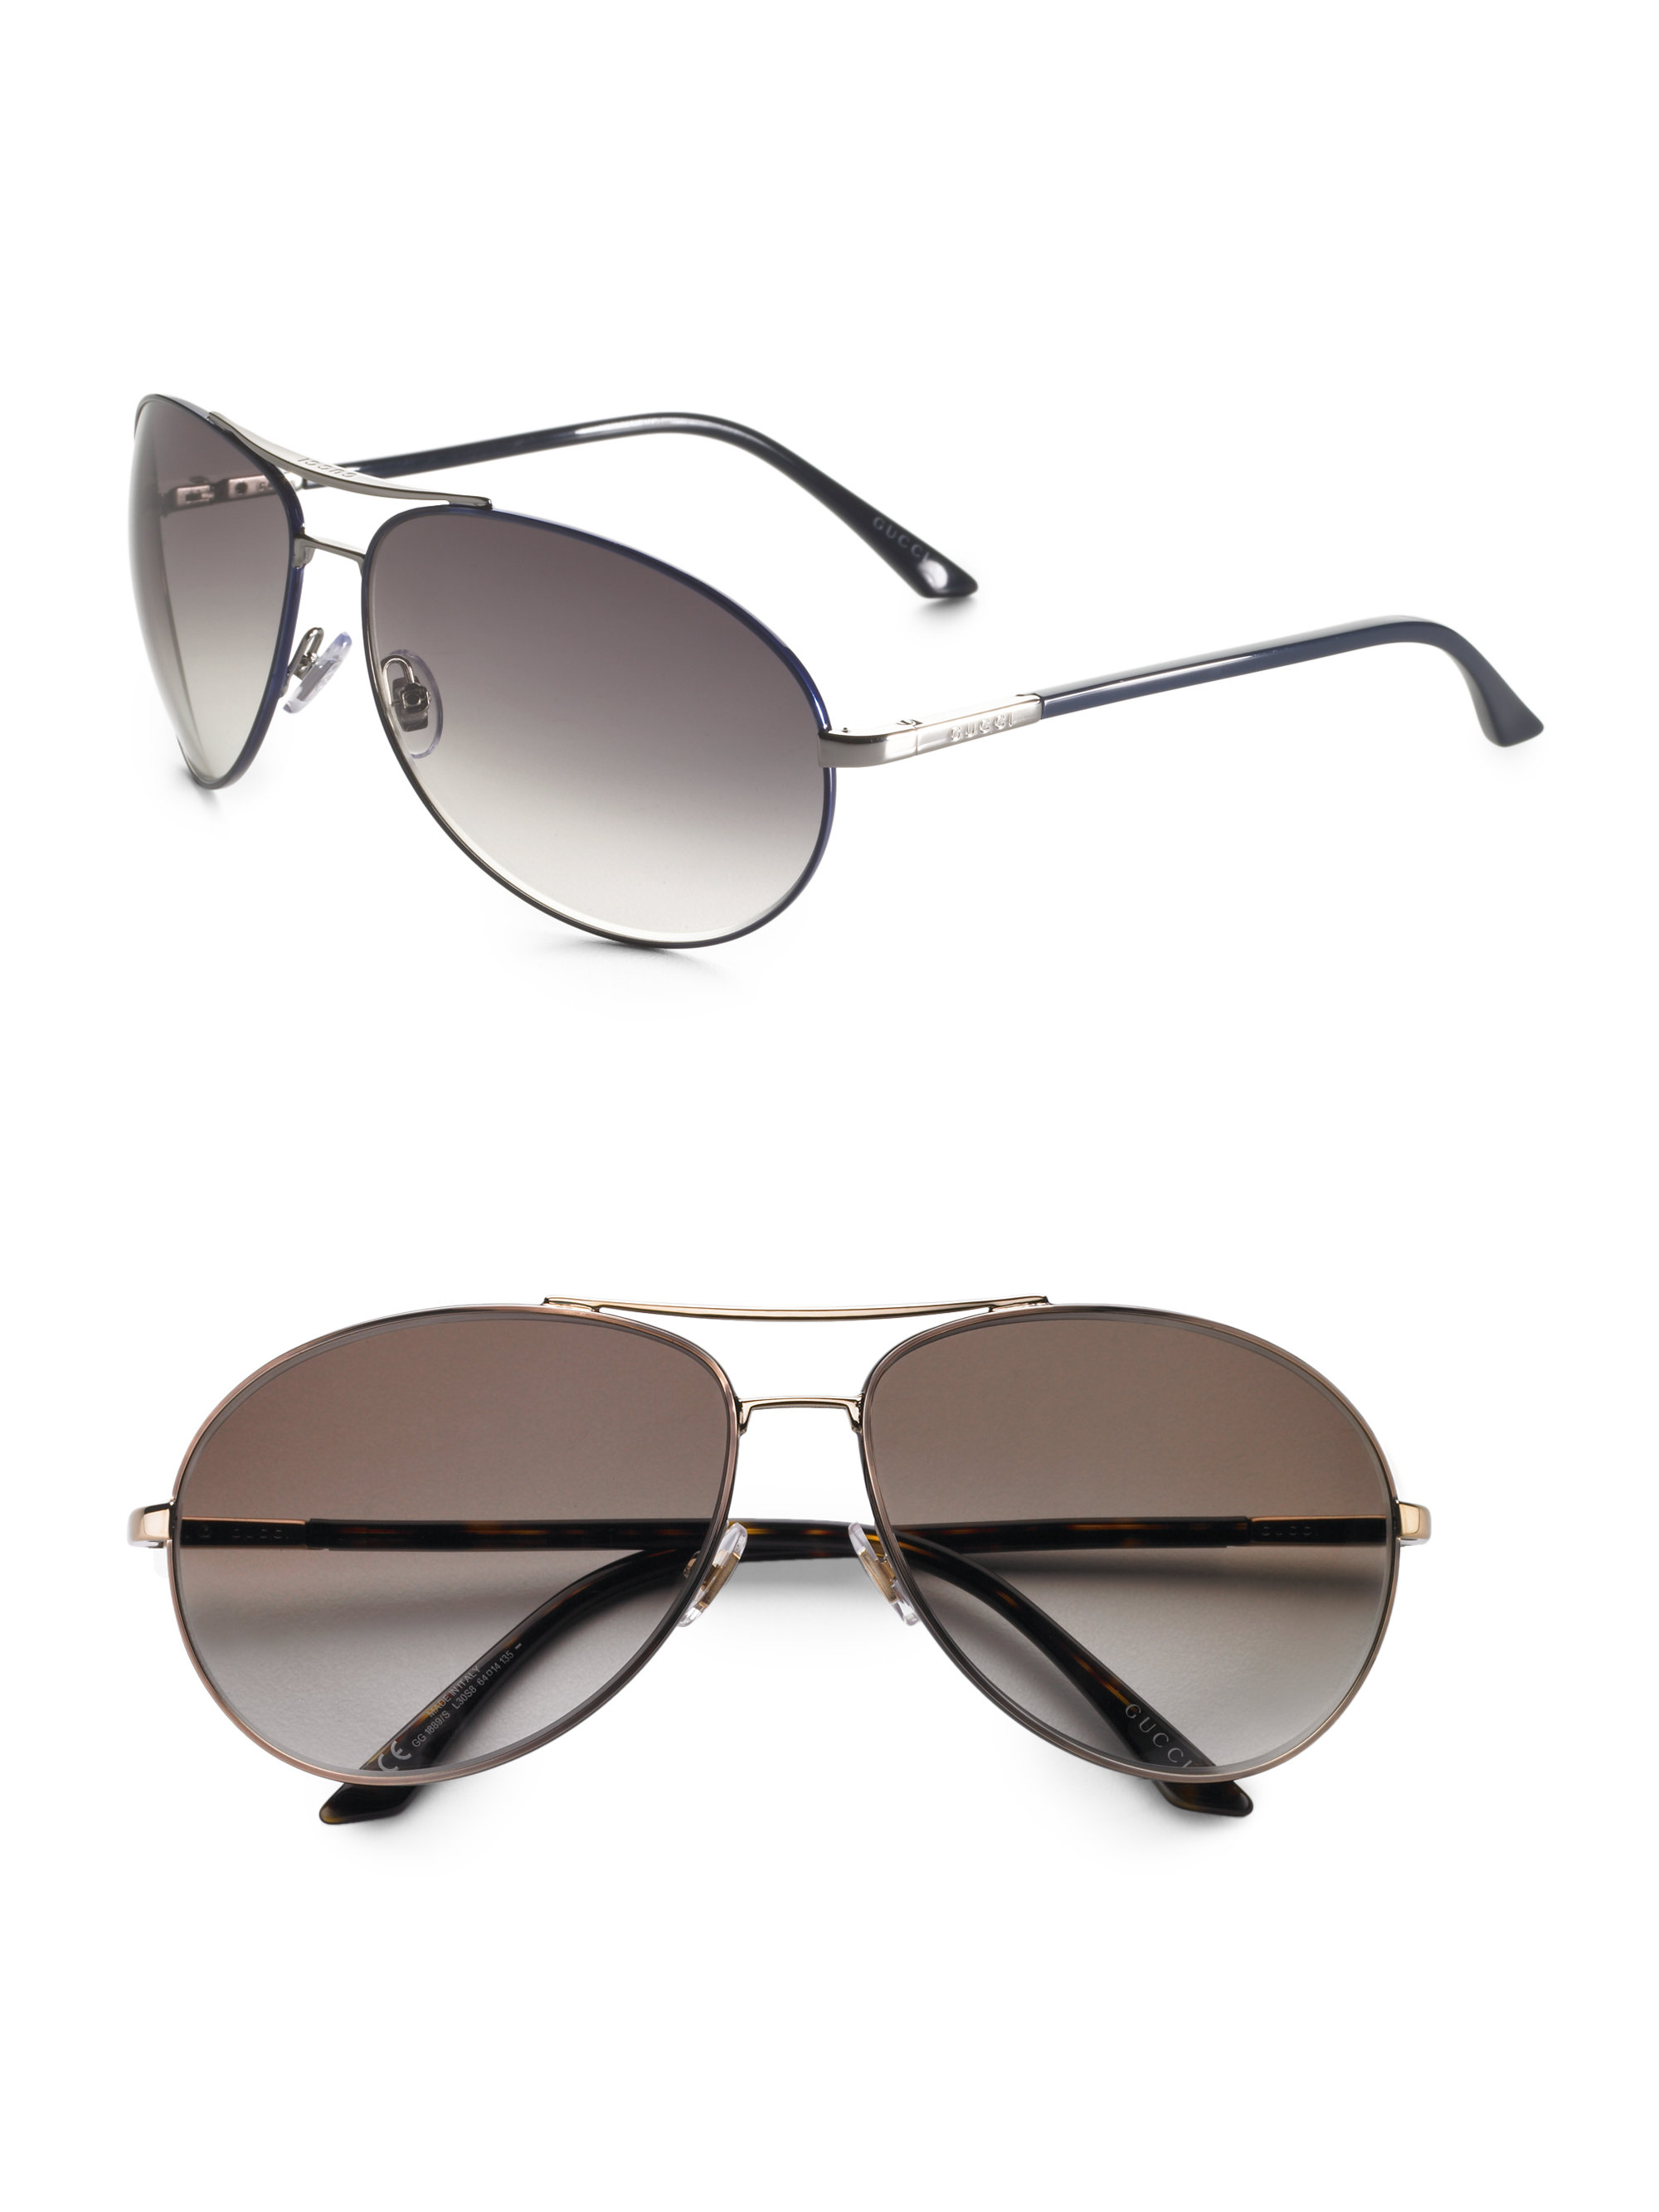 Gucci Aviator Sunglasses in Gold (dark gold frame, brown ...